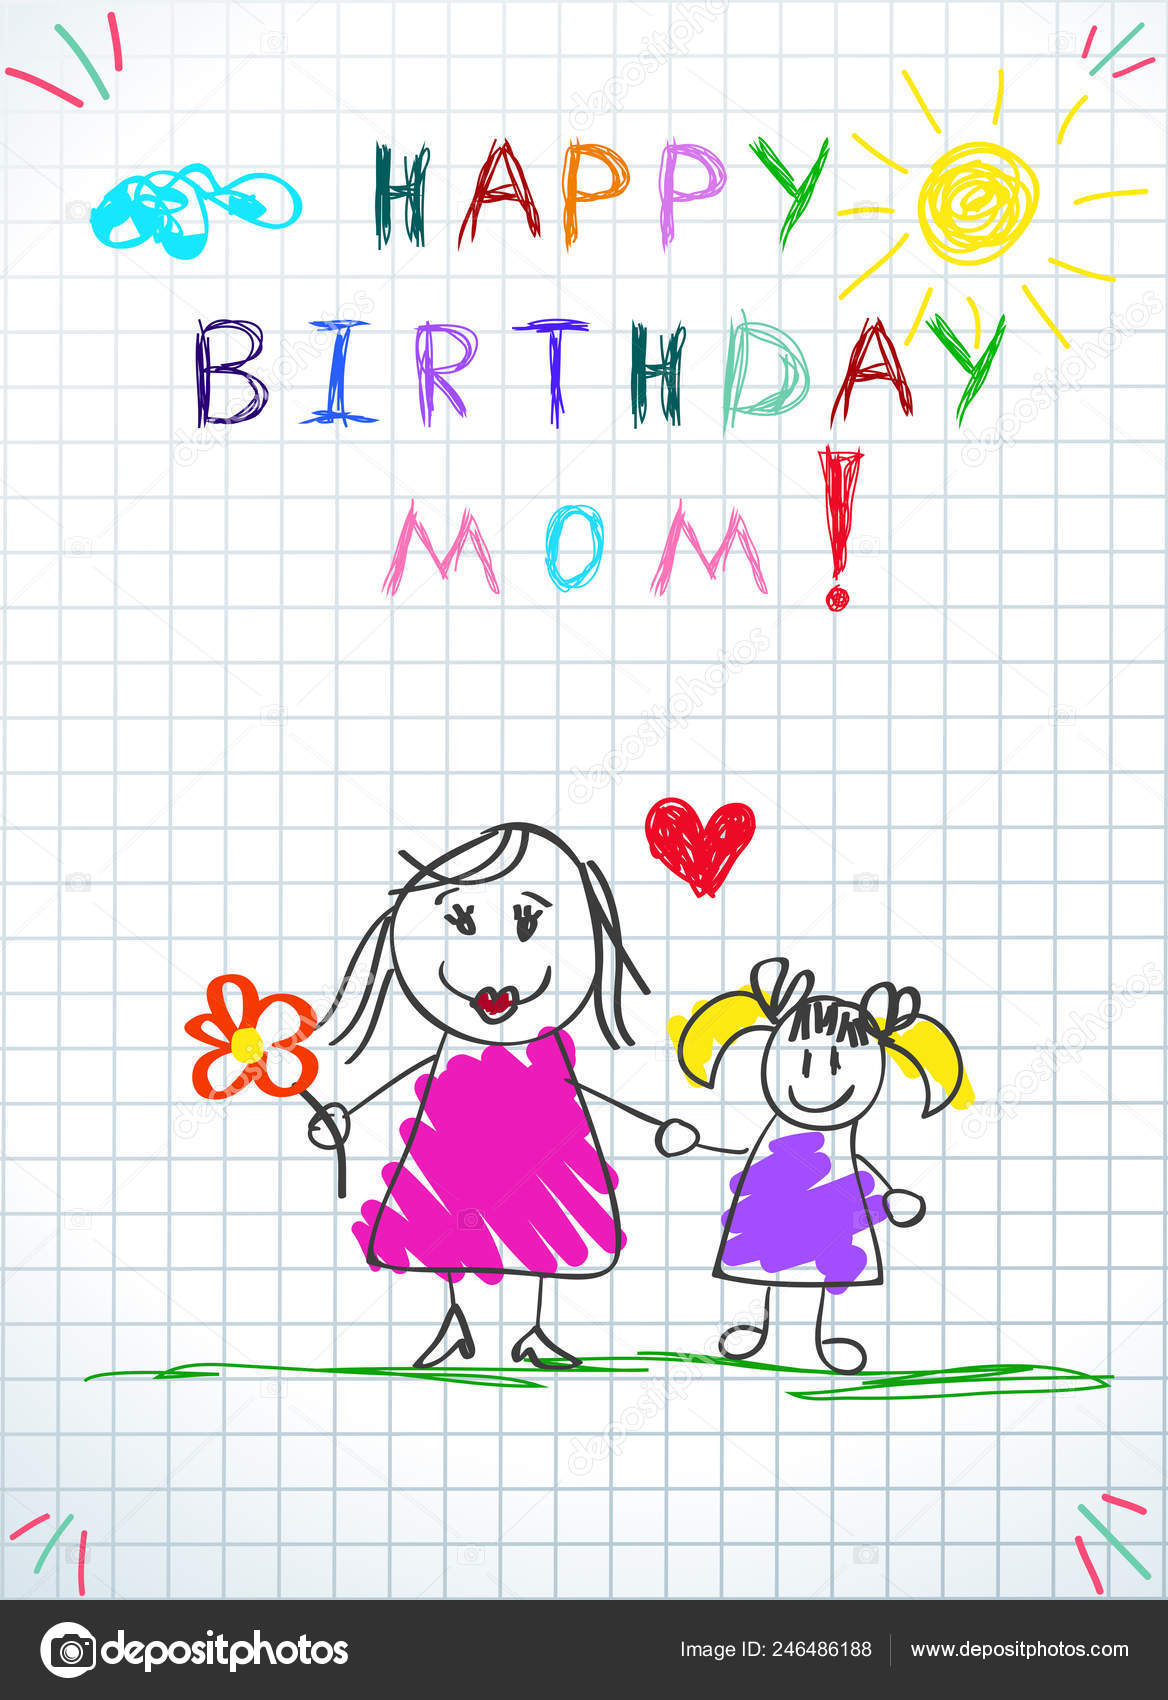 Happy Birthday Mom Children Colorful Hand Drawn Vector